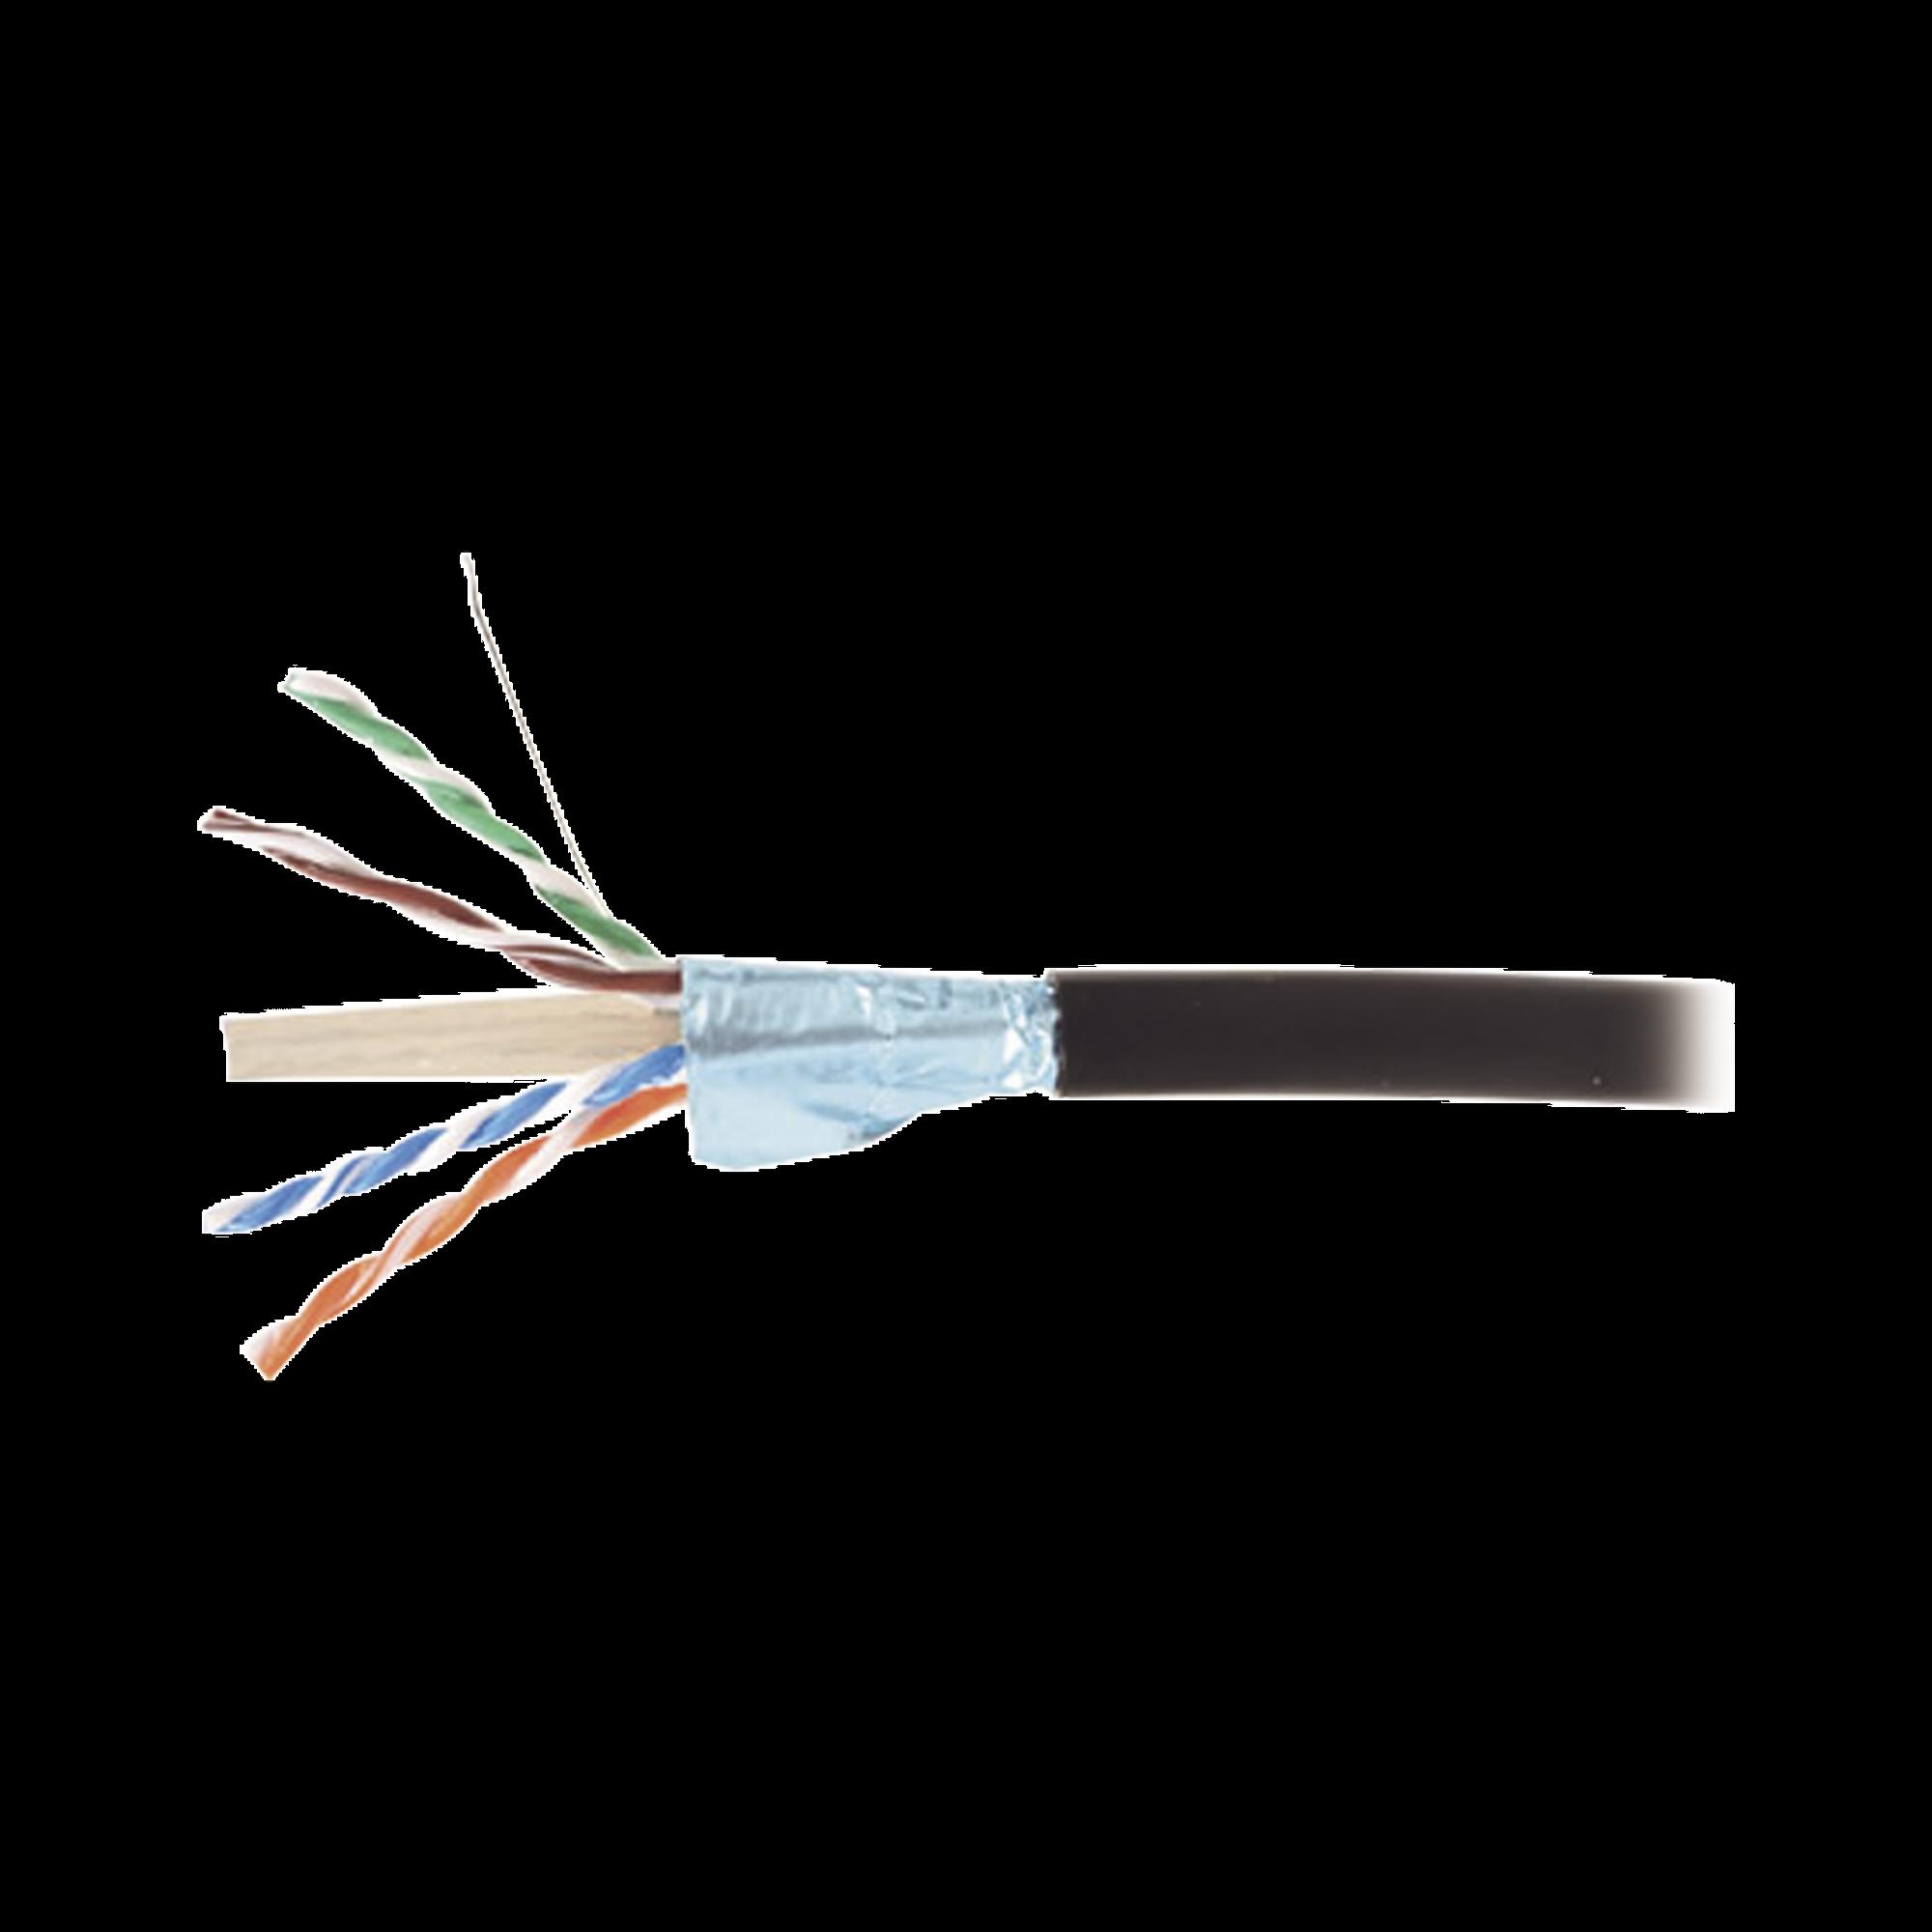 Bobina de Cable Blindado F/UTP de 4 Pares, Para Exterior con Gel, Cat6A (23 AWG), Industrial para Climas Extremos, Enterrado Directo, Color Negro, 305 m